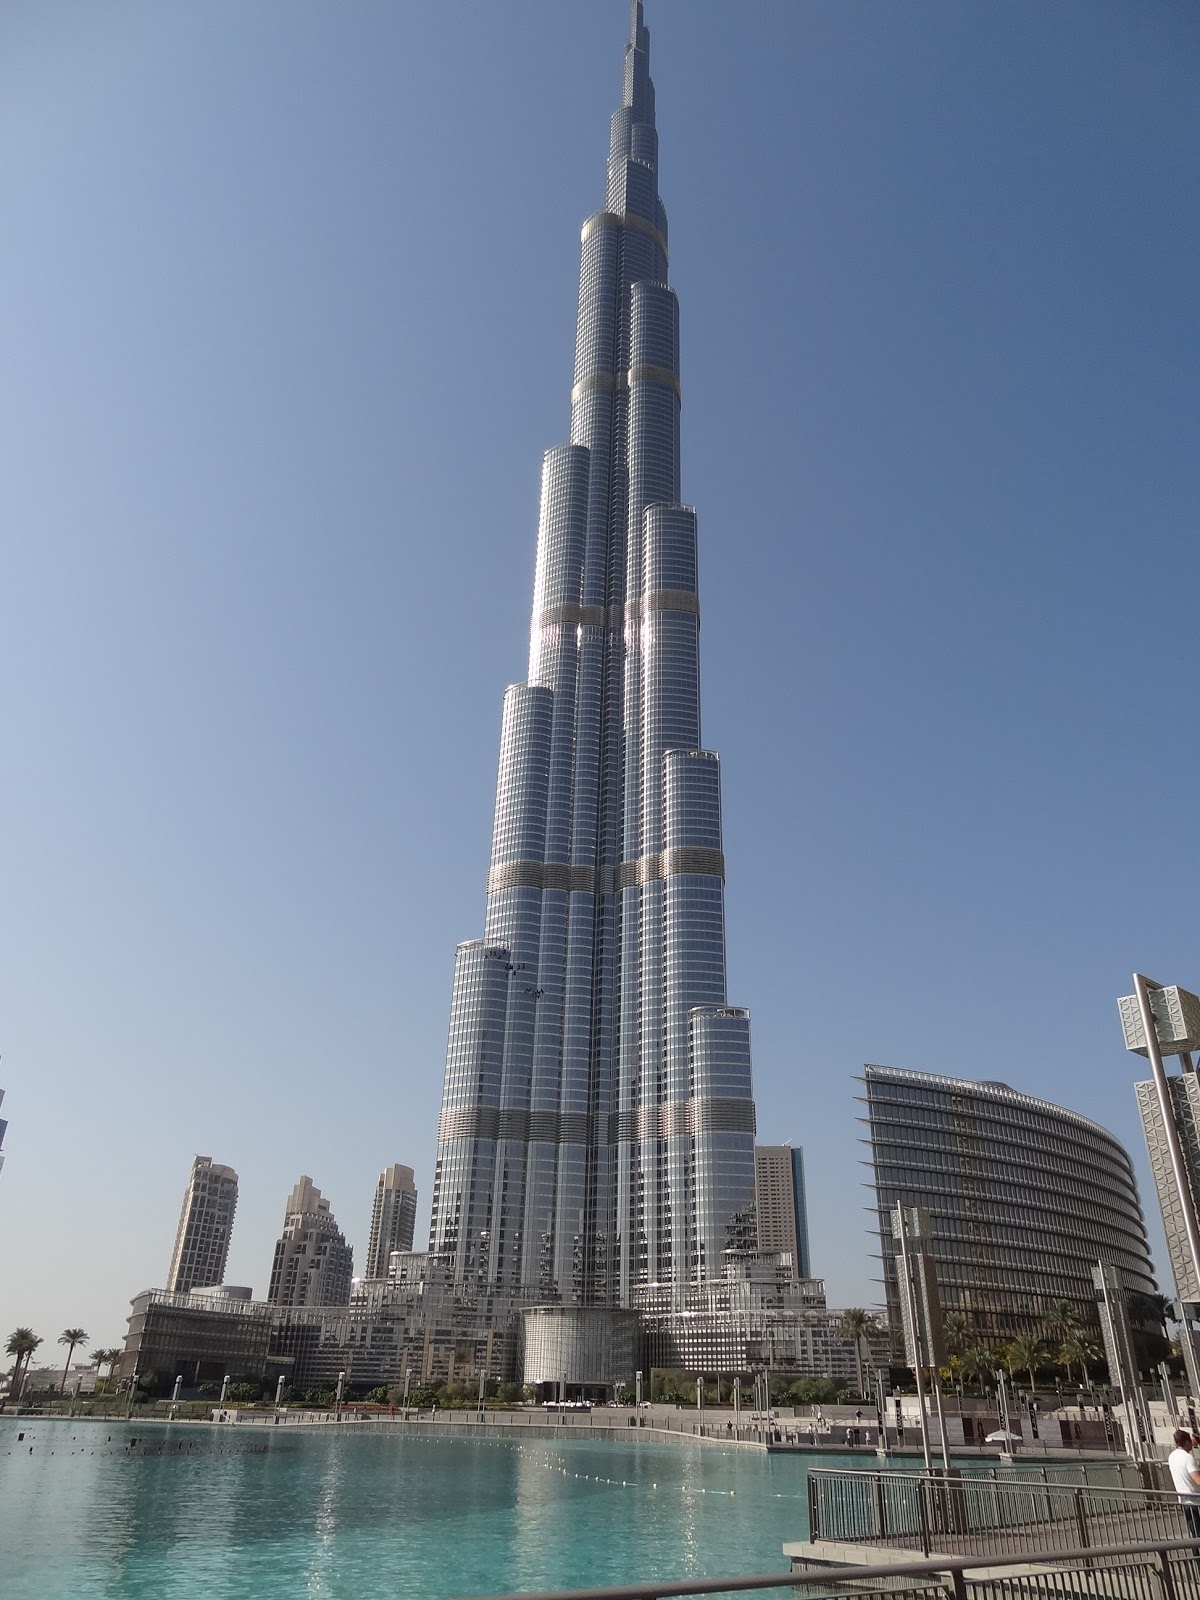 Burj Khalifa ~ Did you know that